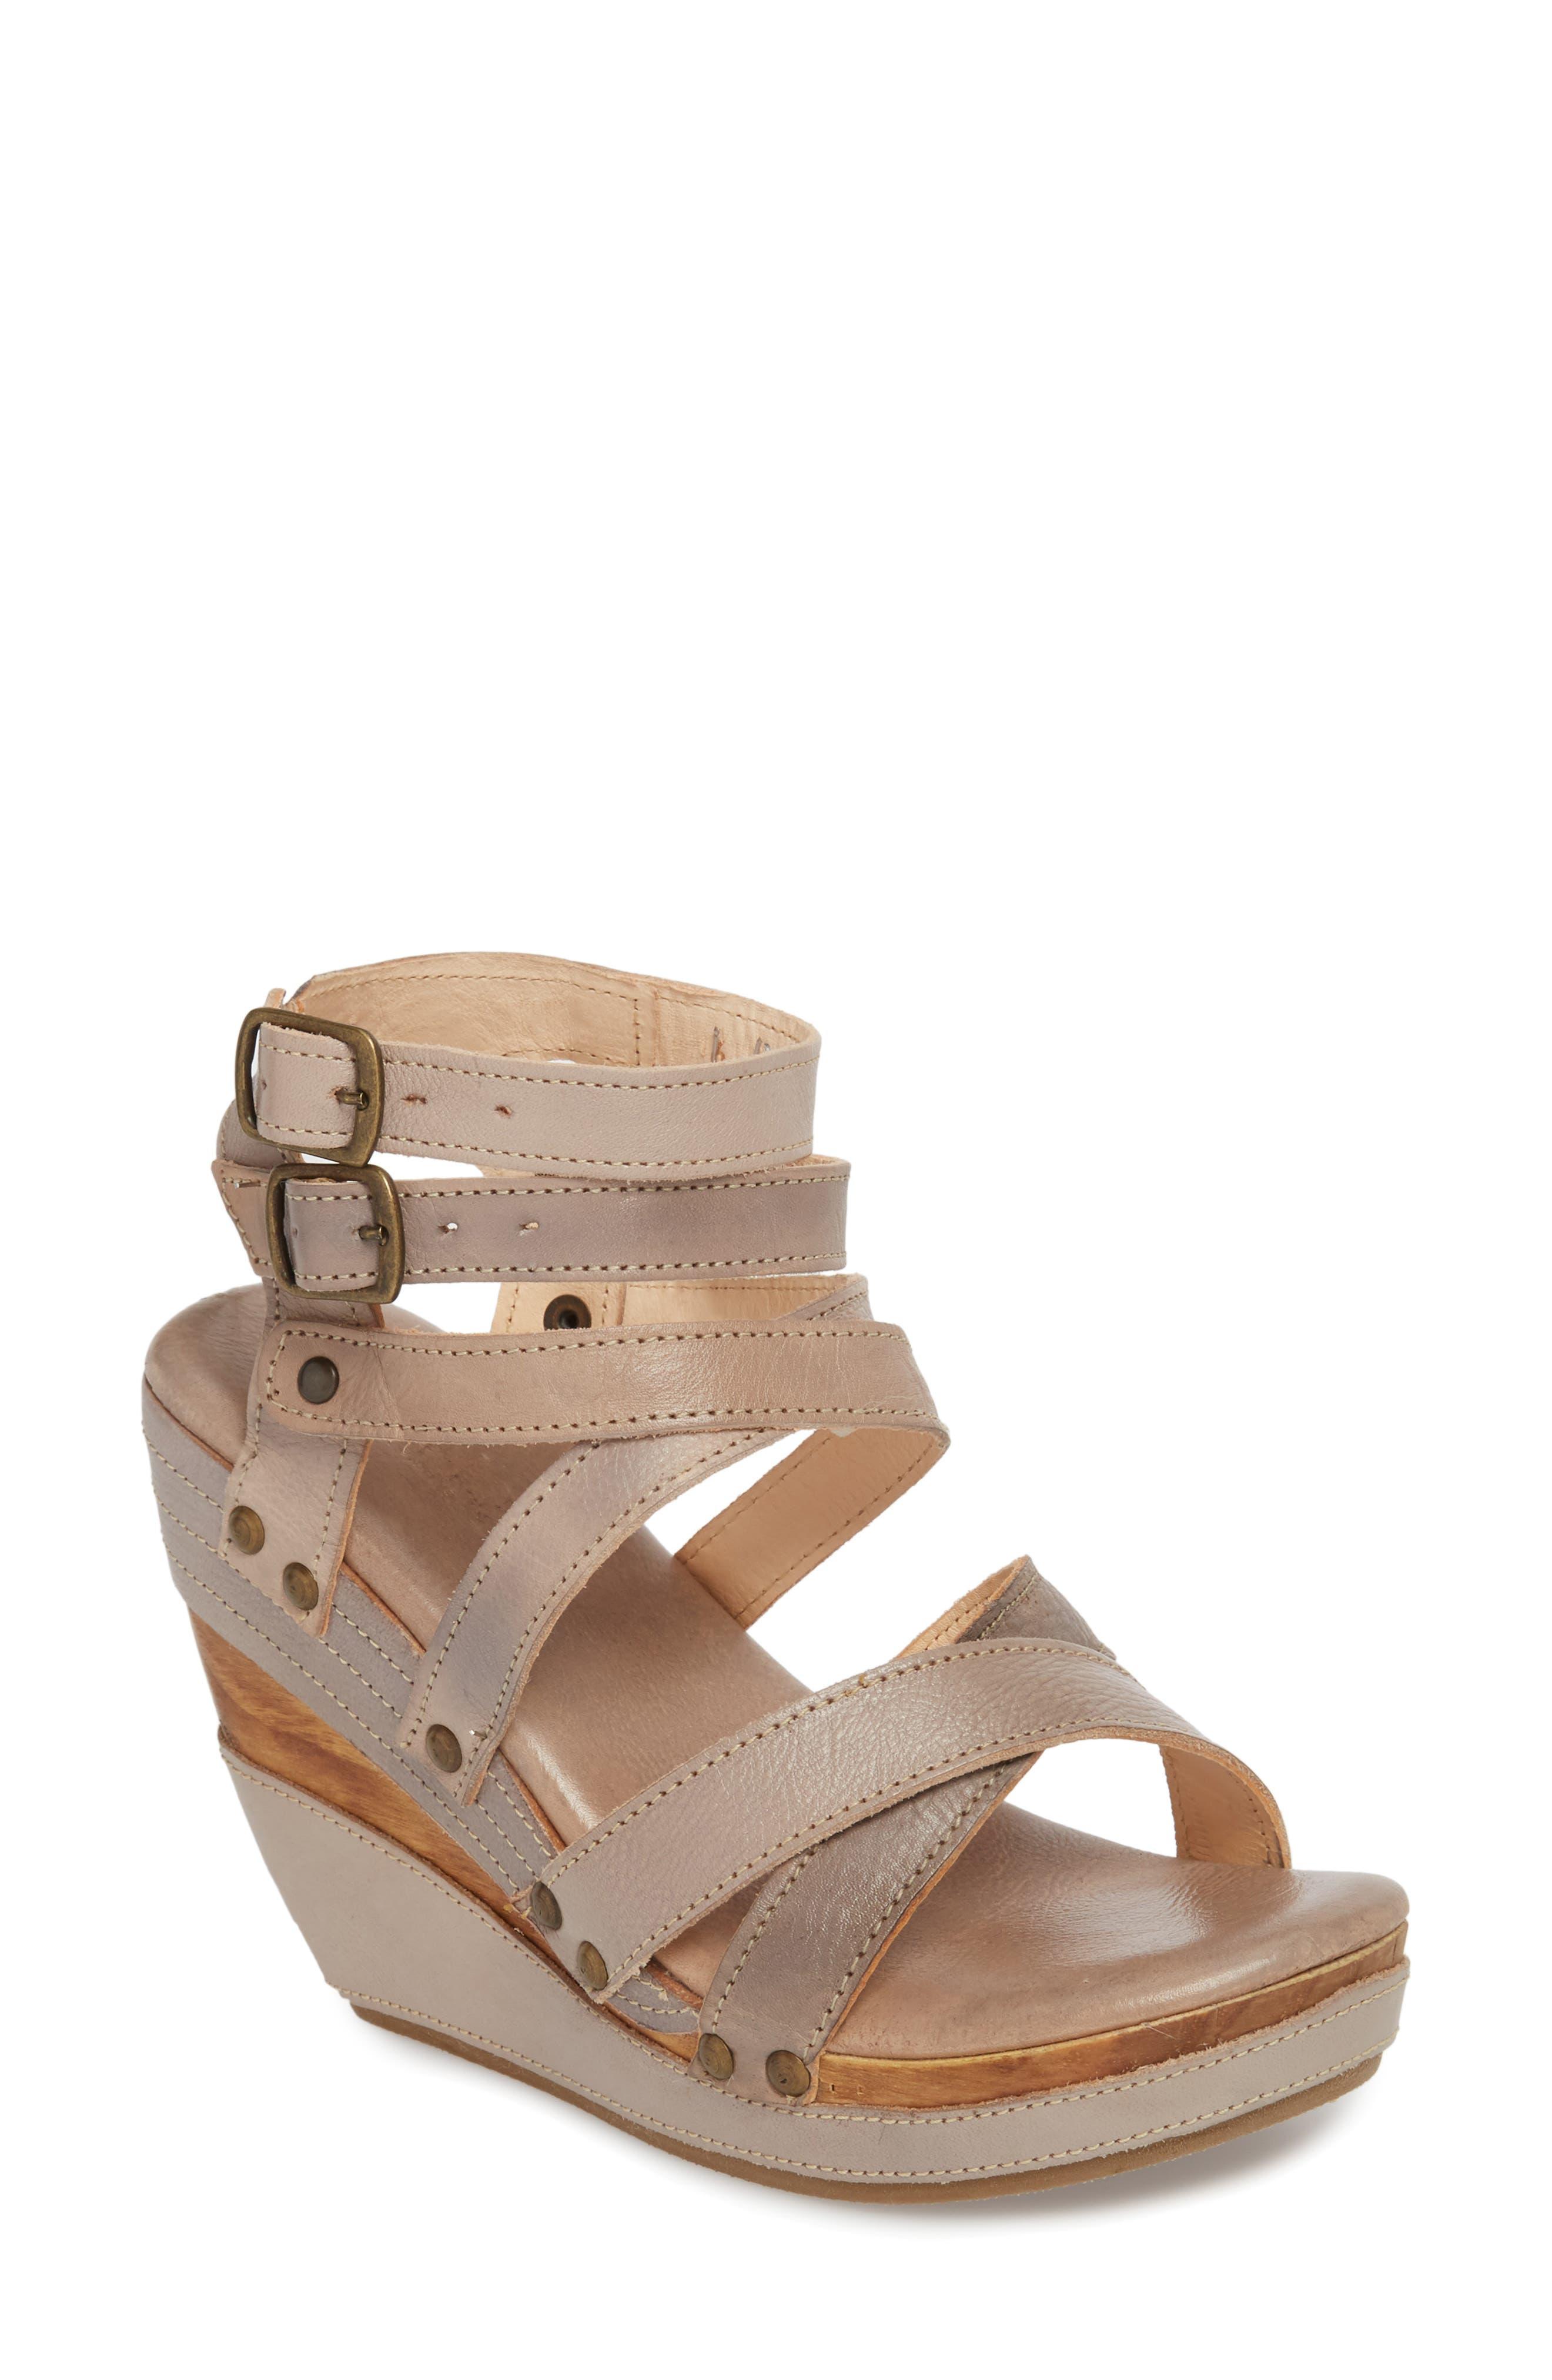 'Juliana' Sandal,                         Main,                         color, Light Grey Leather